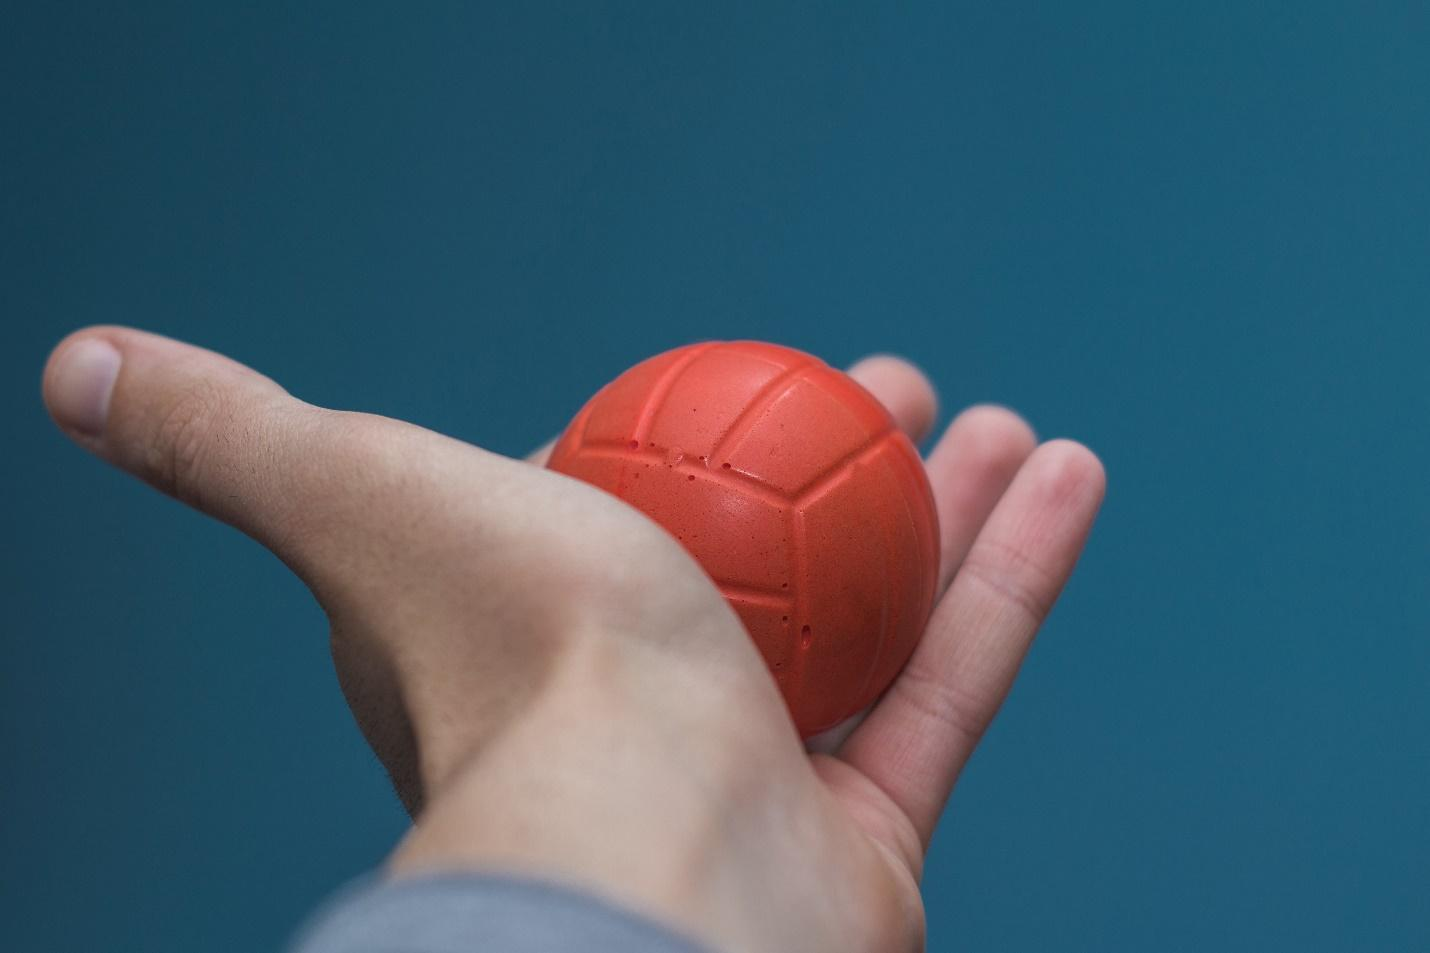 मऊ बॉल पिळा